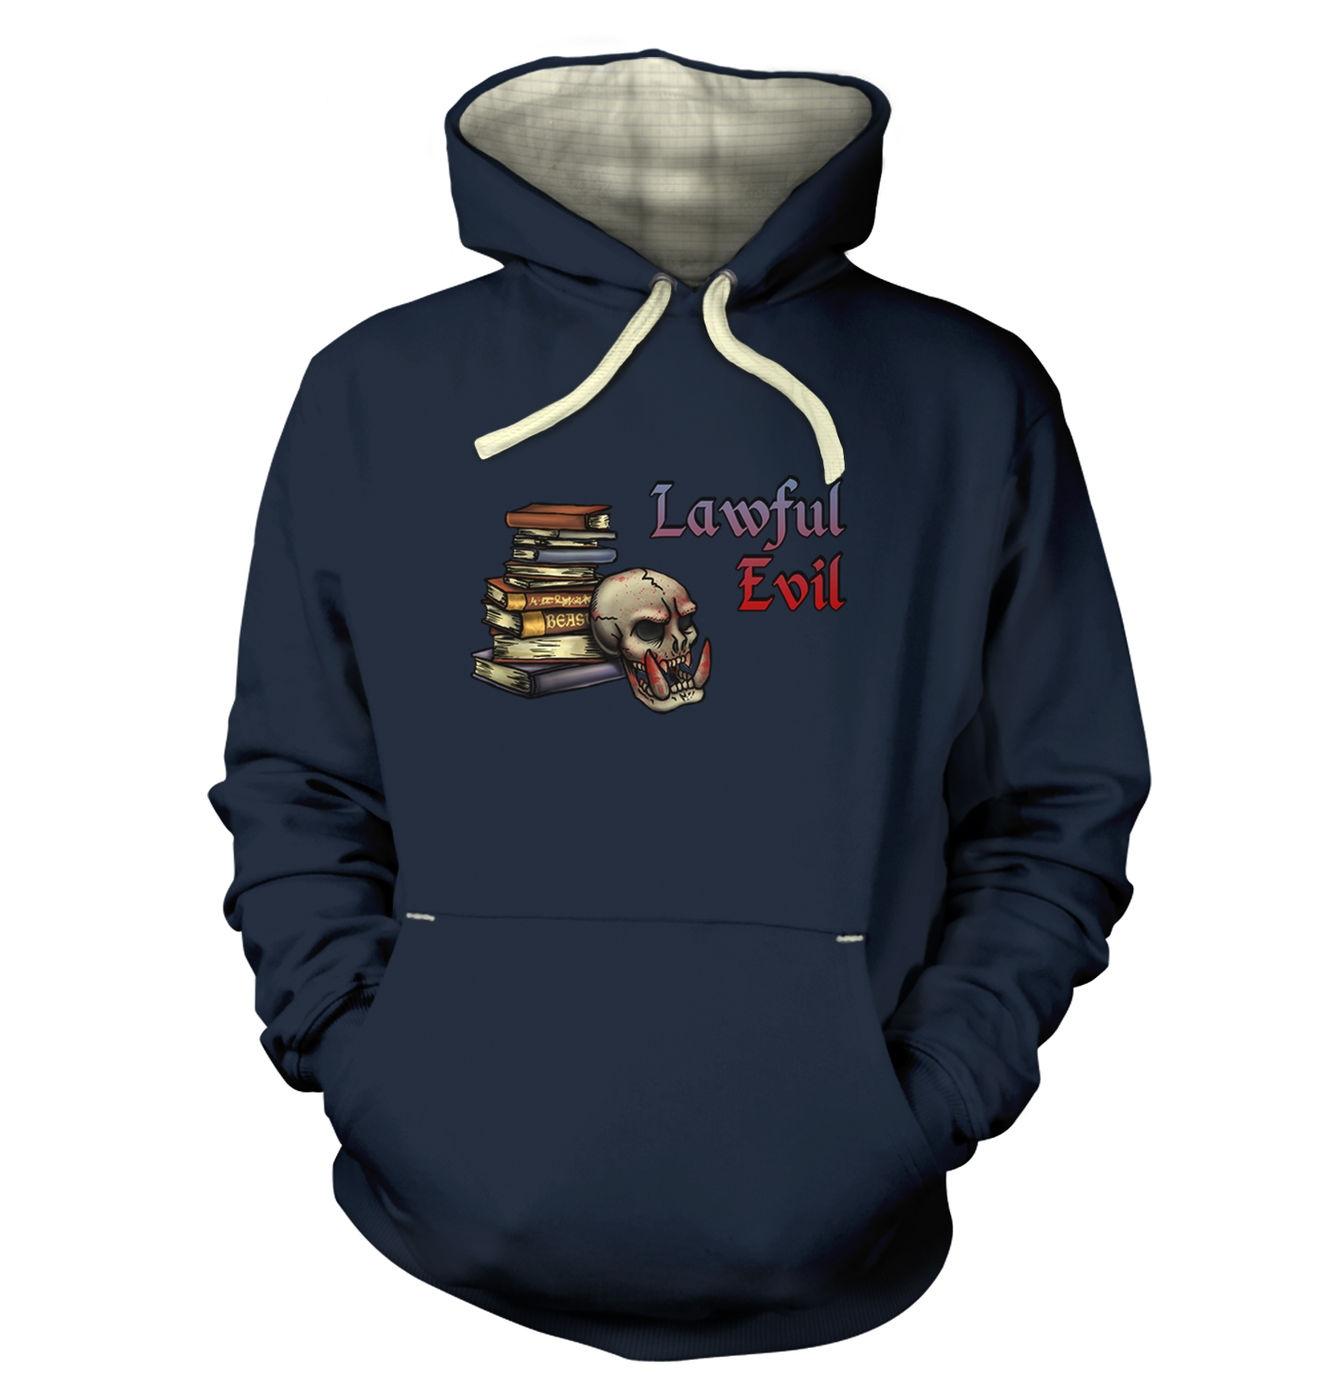 Cartoon Alignment Lawful Evil - premium adult gaming hoodies